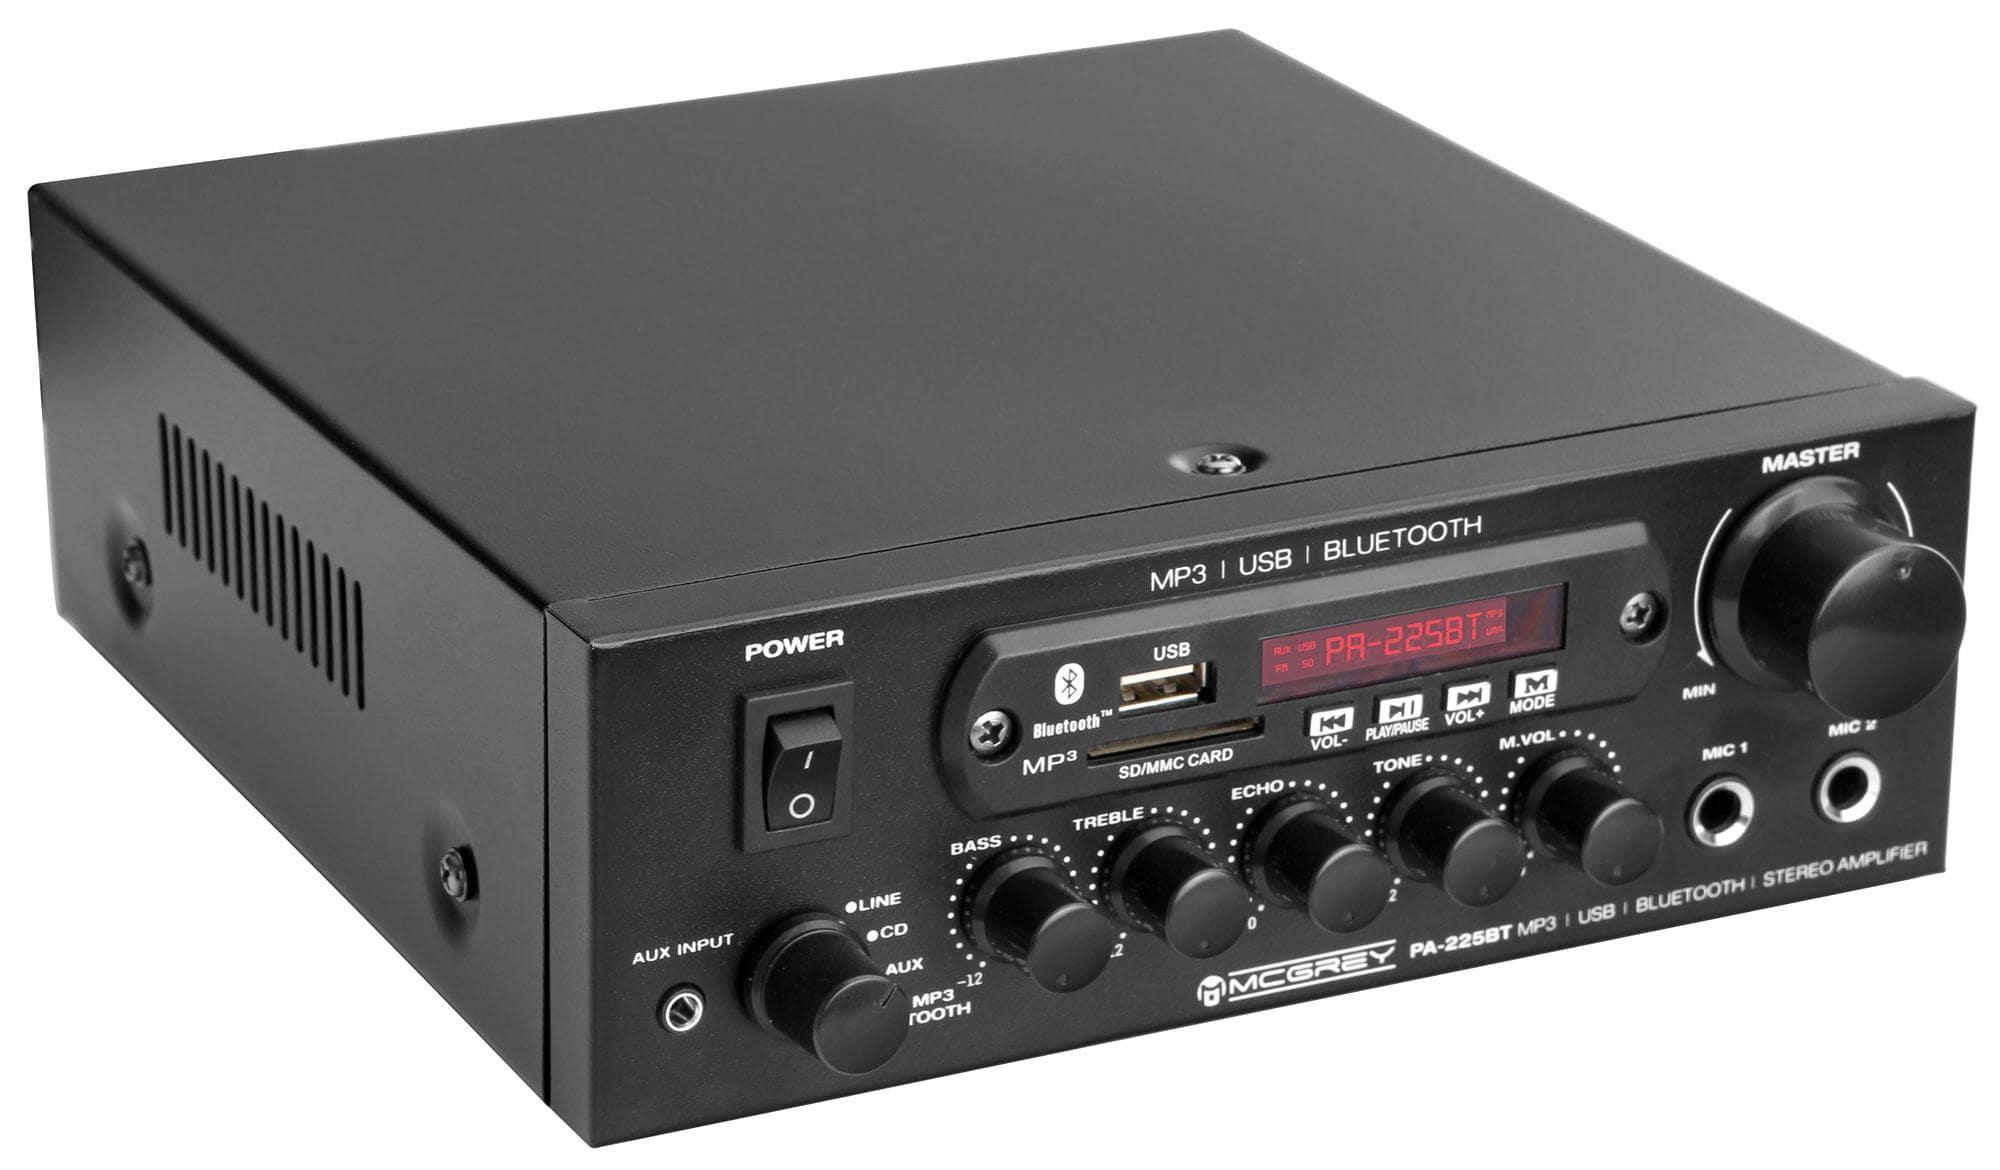 McGrey PA 225BT Bluetooth Endstufe mit USB|MP3 Player Retoure (Zustand akzeptabel)